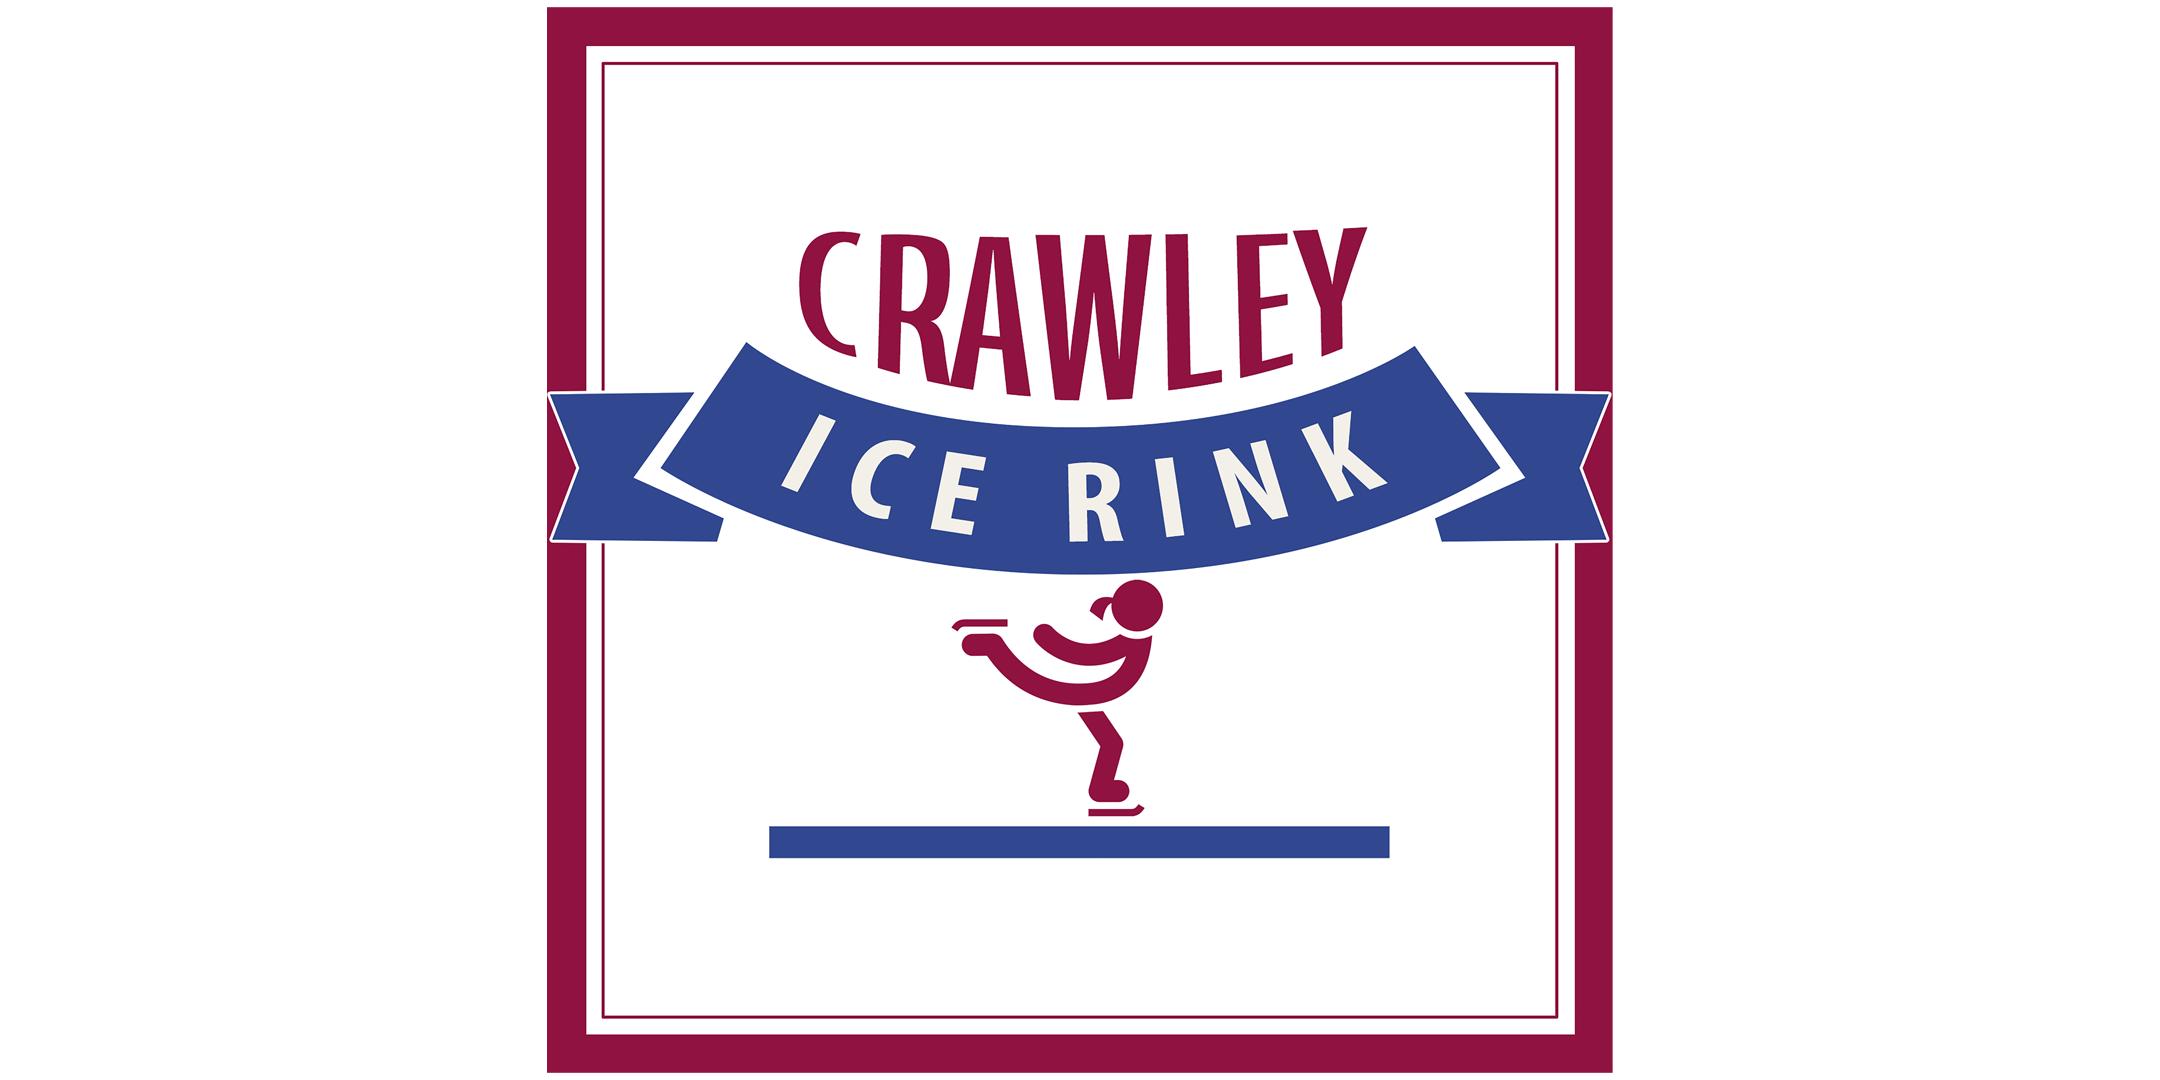 Crawley Ice Rink - 2nd December (Peak)